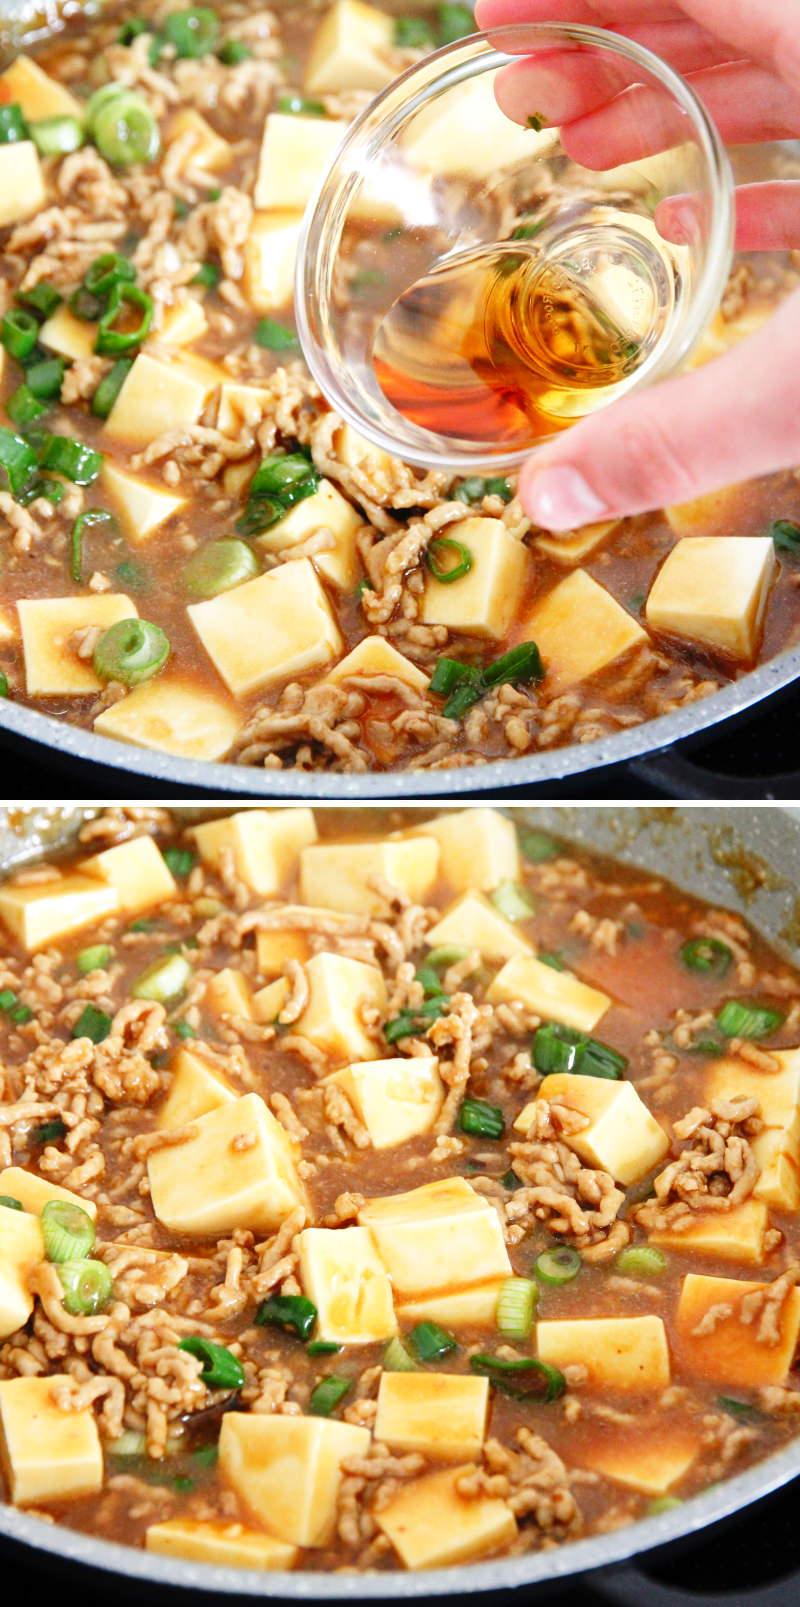 Mapo Tofu Schritt 12 mit Sesam würzen